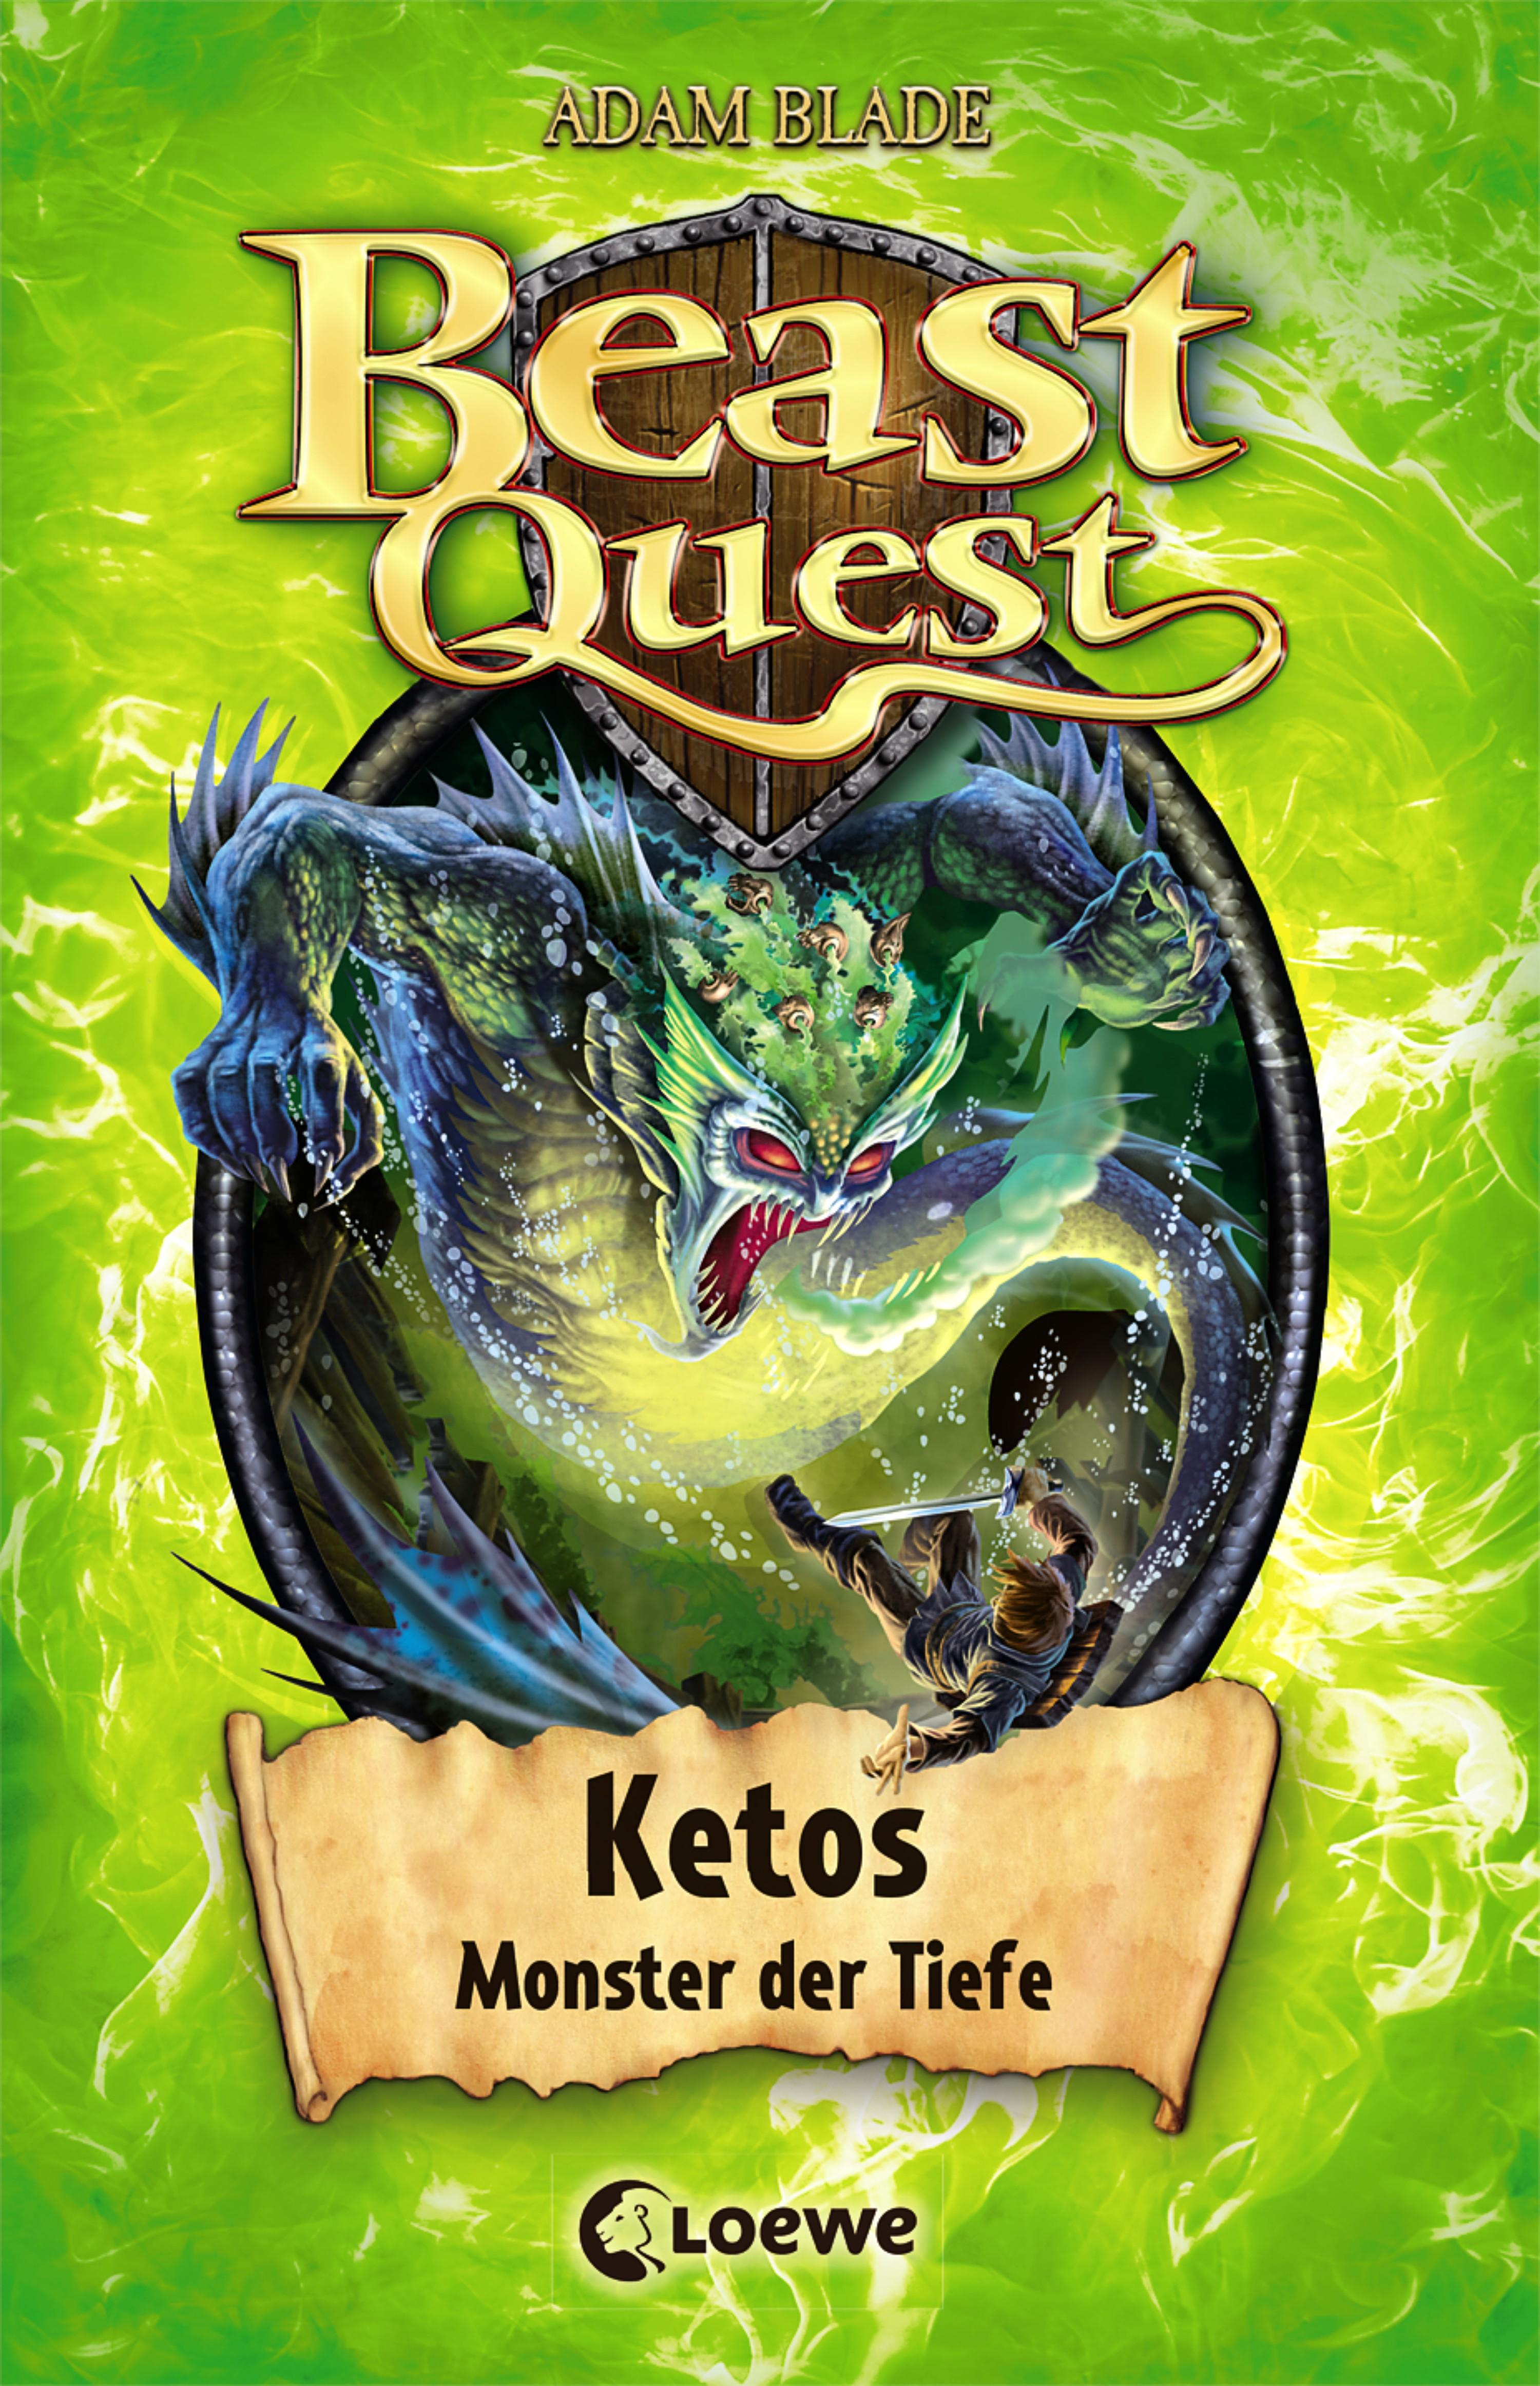 цена Adam Blade Beast Quest 53 - Ketos, Monster der Tiefe